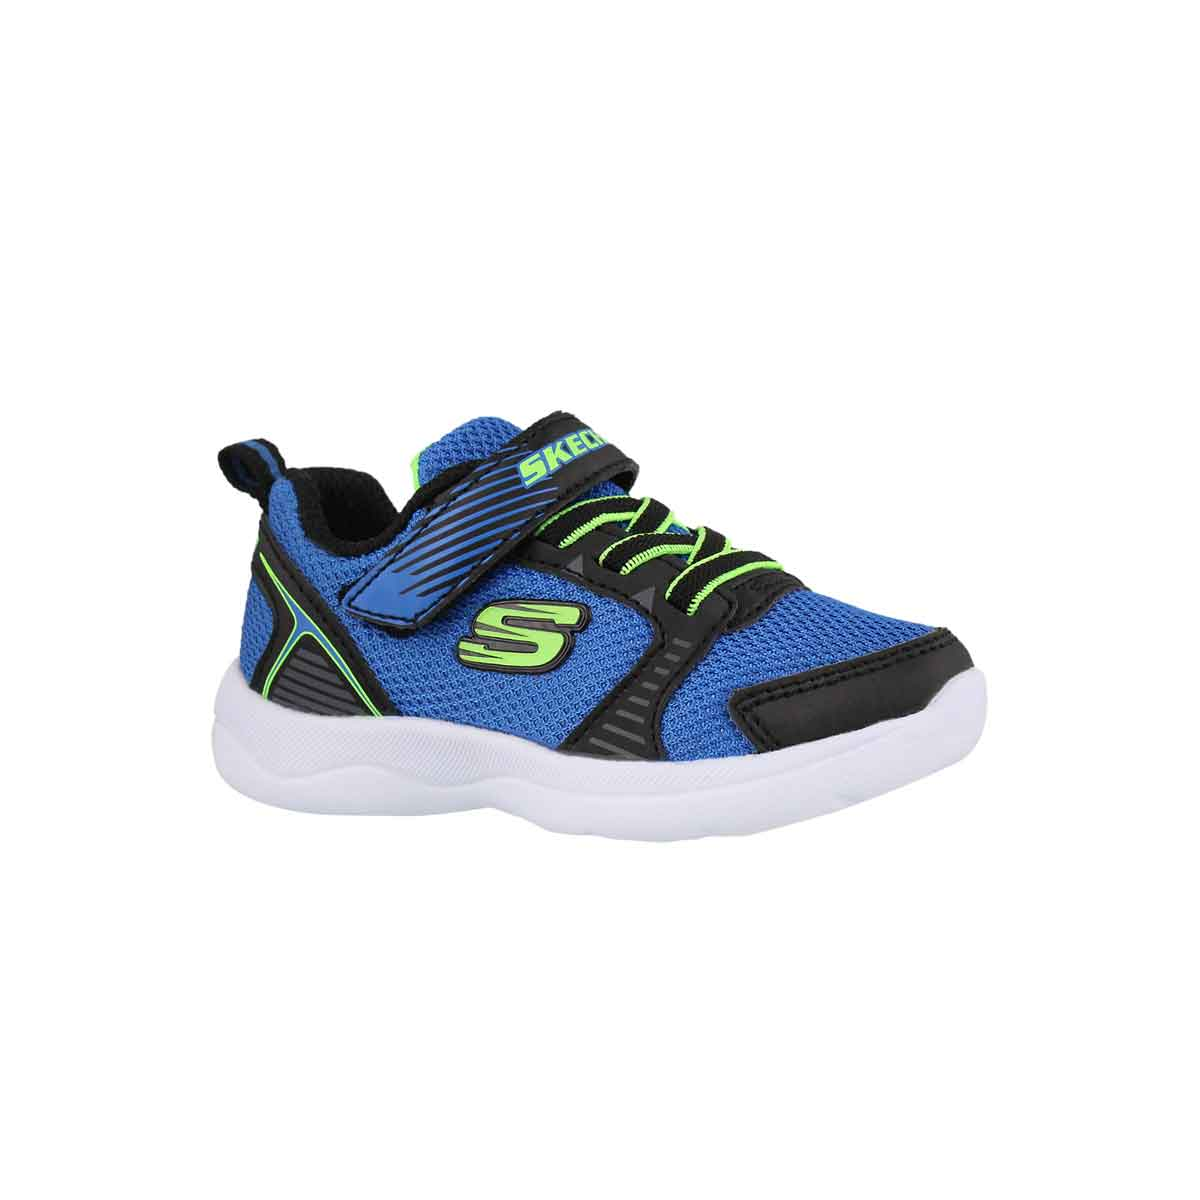 Inf-b Skech-Stepz 2.0 blue/black sneaker